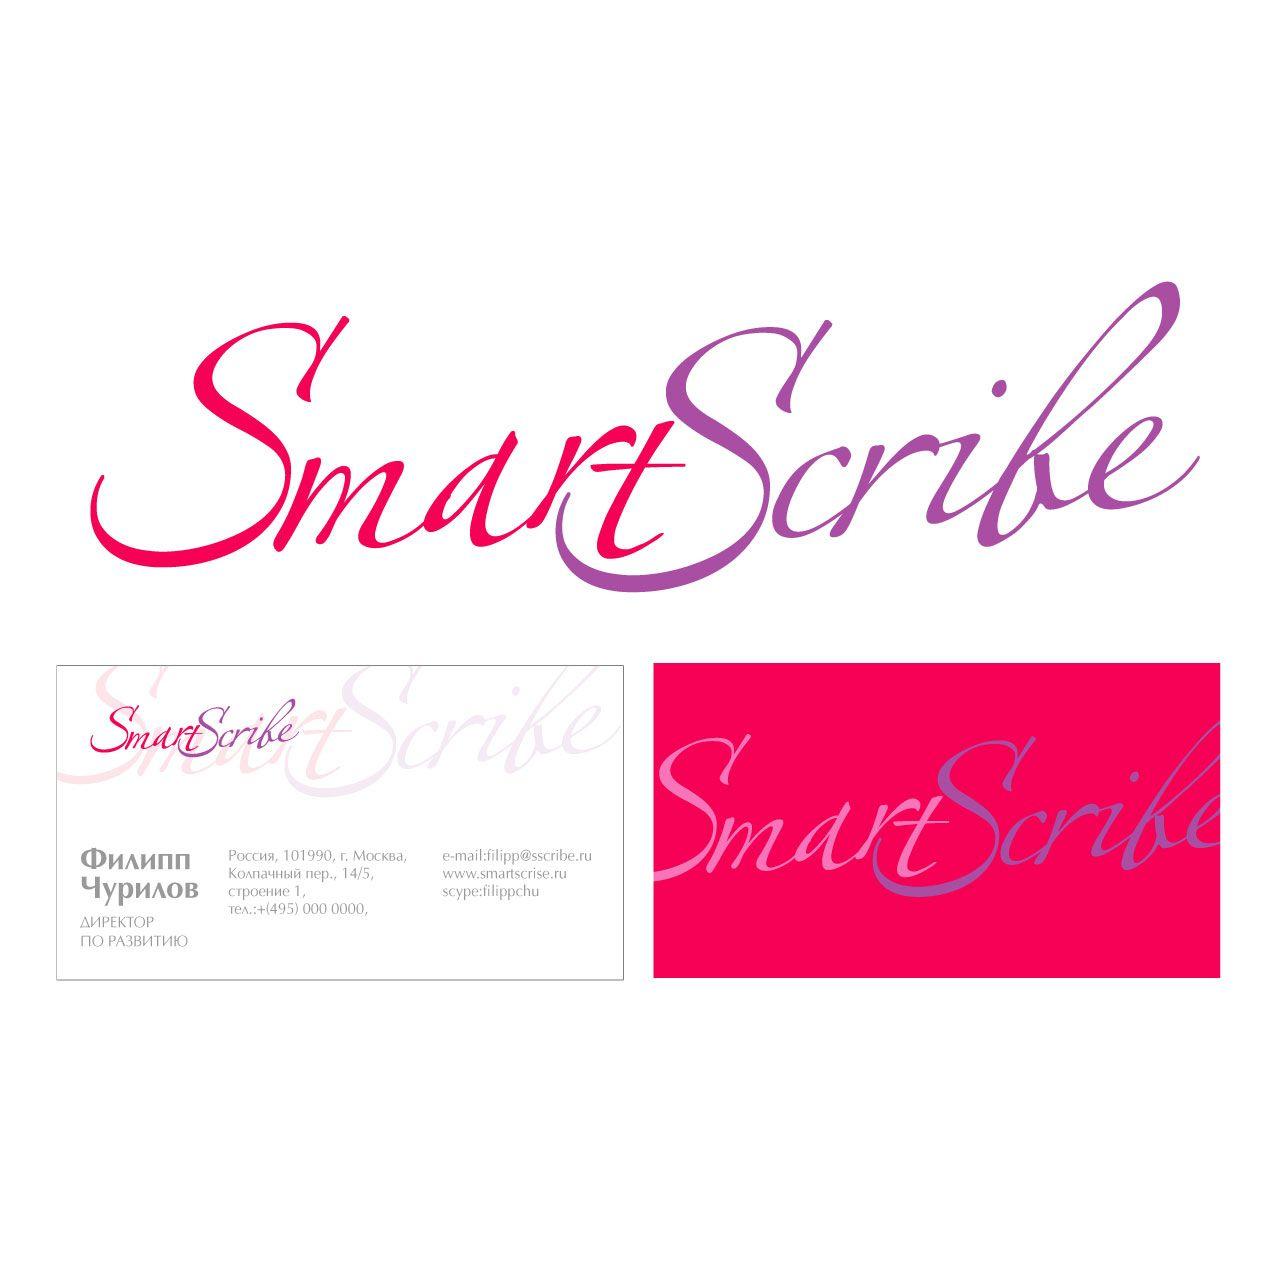 Лого, визитка и шаблон презентации для SmartScribe - дизайнер zhutol